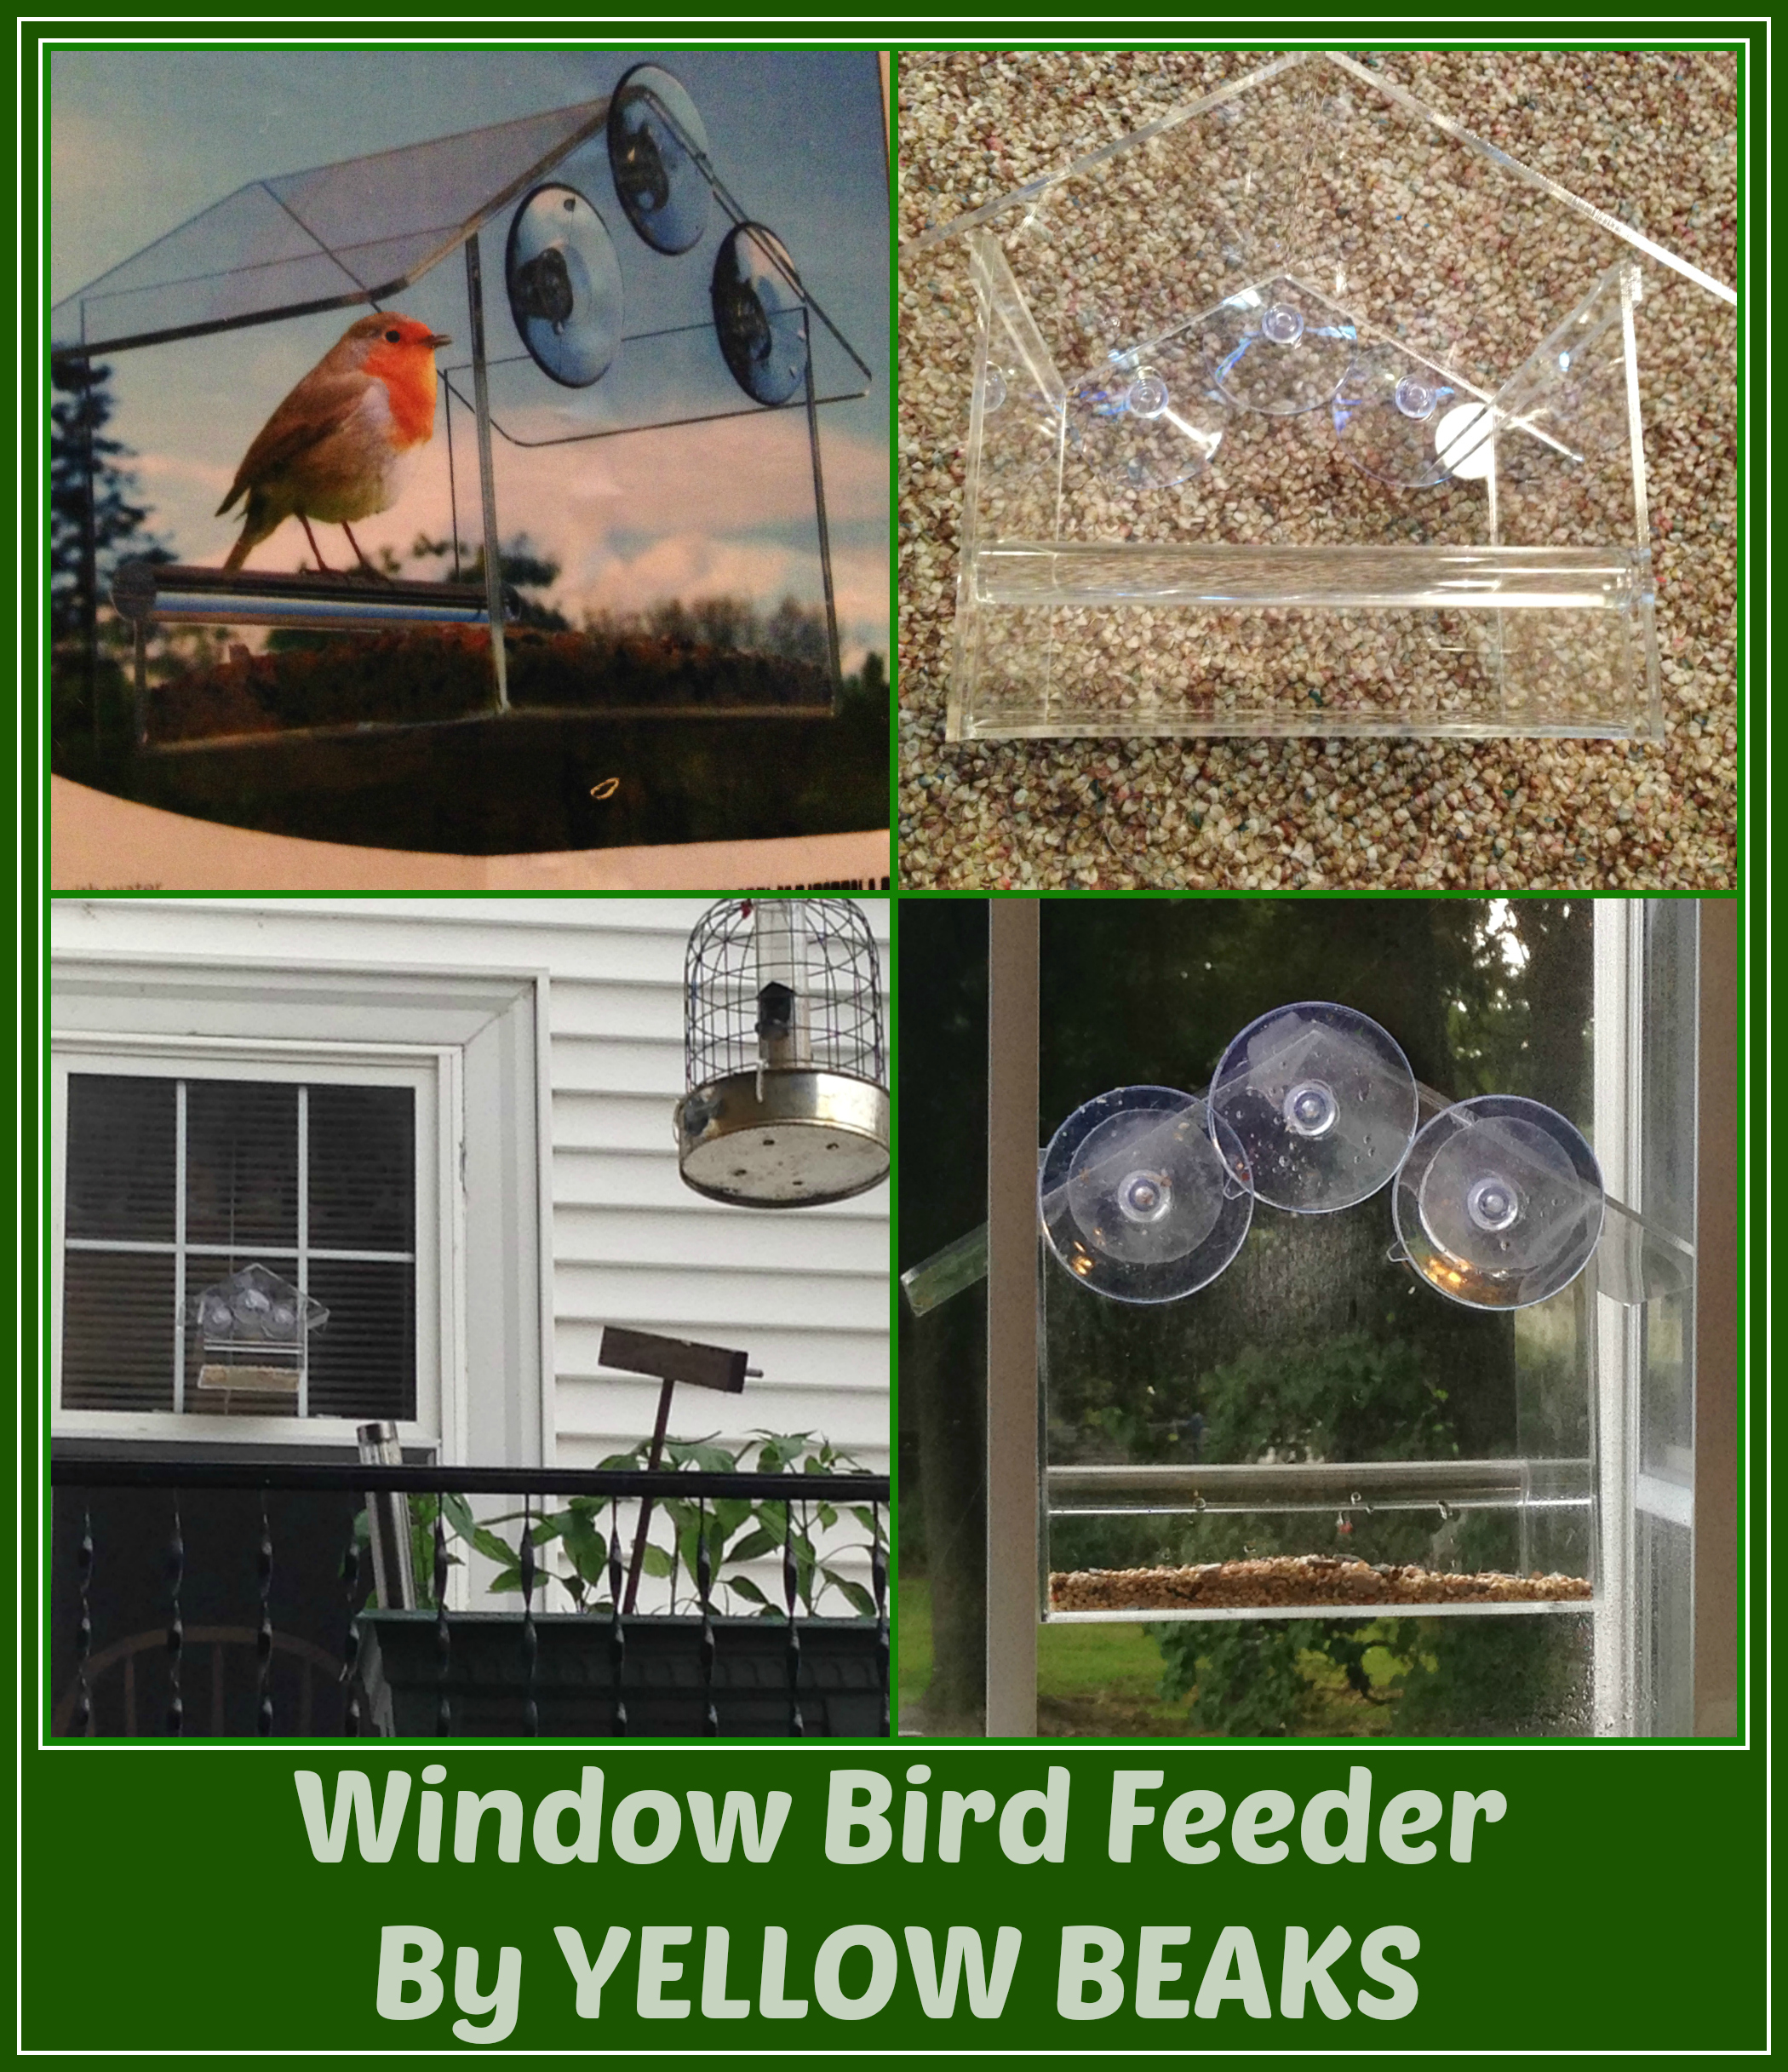 window bird feeder by yellow beaks